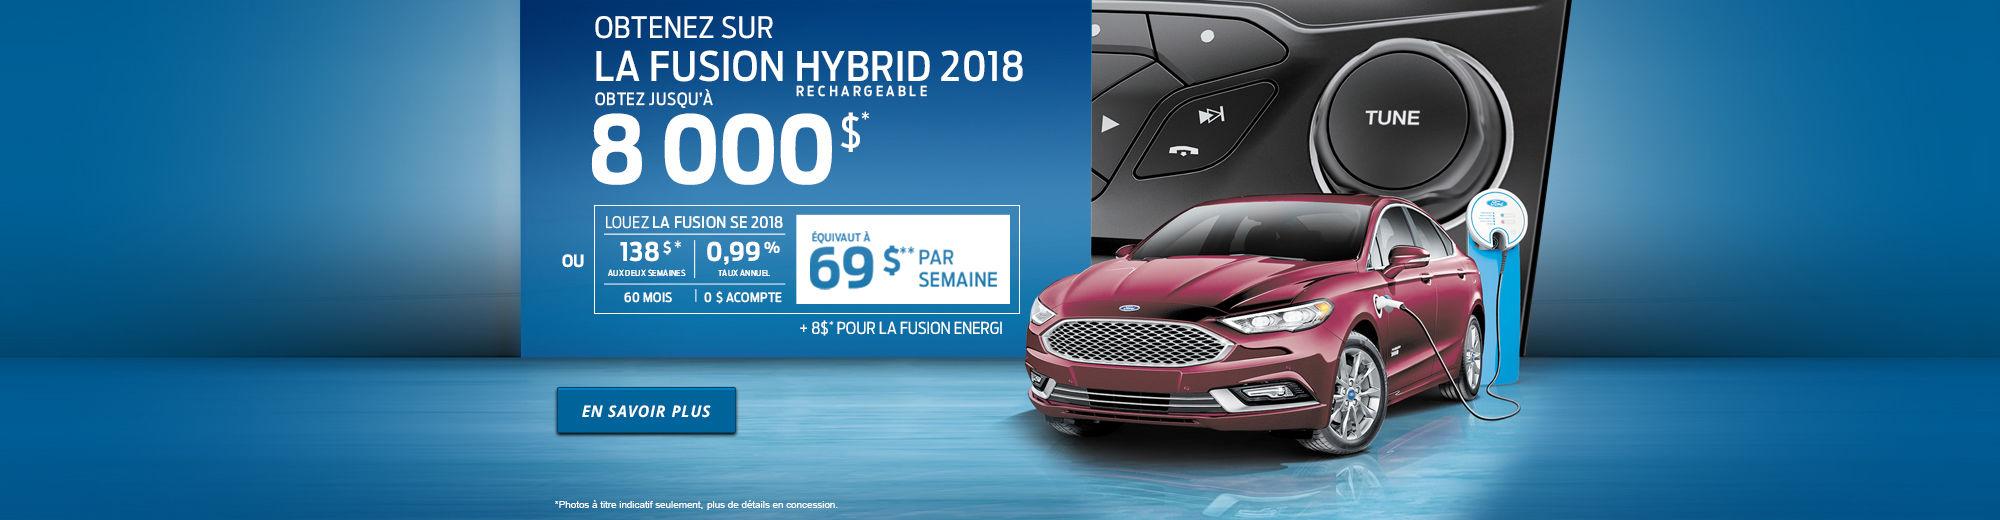 8 000 $ DE RABAIS - Fusion HYBRID rechargeable 2018